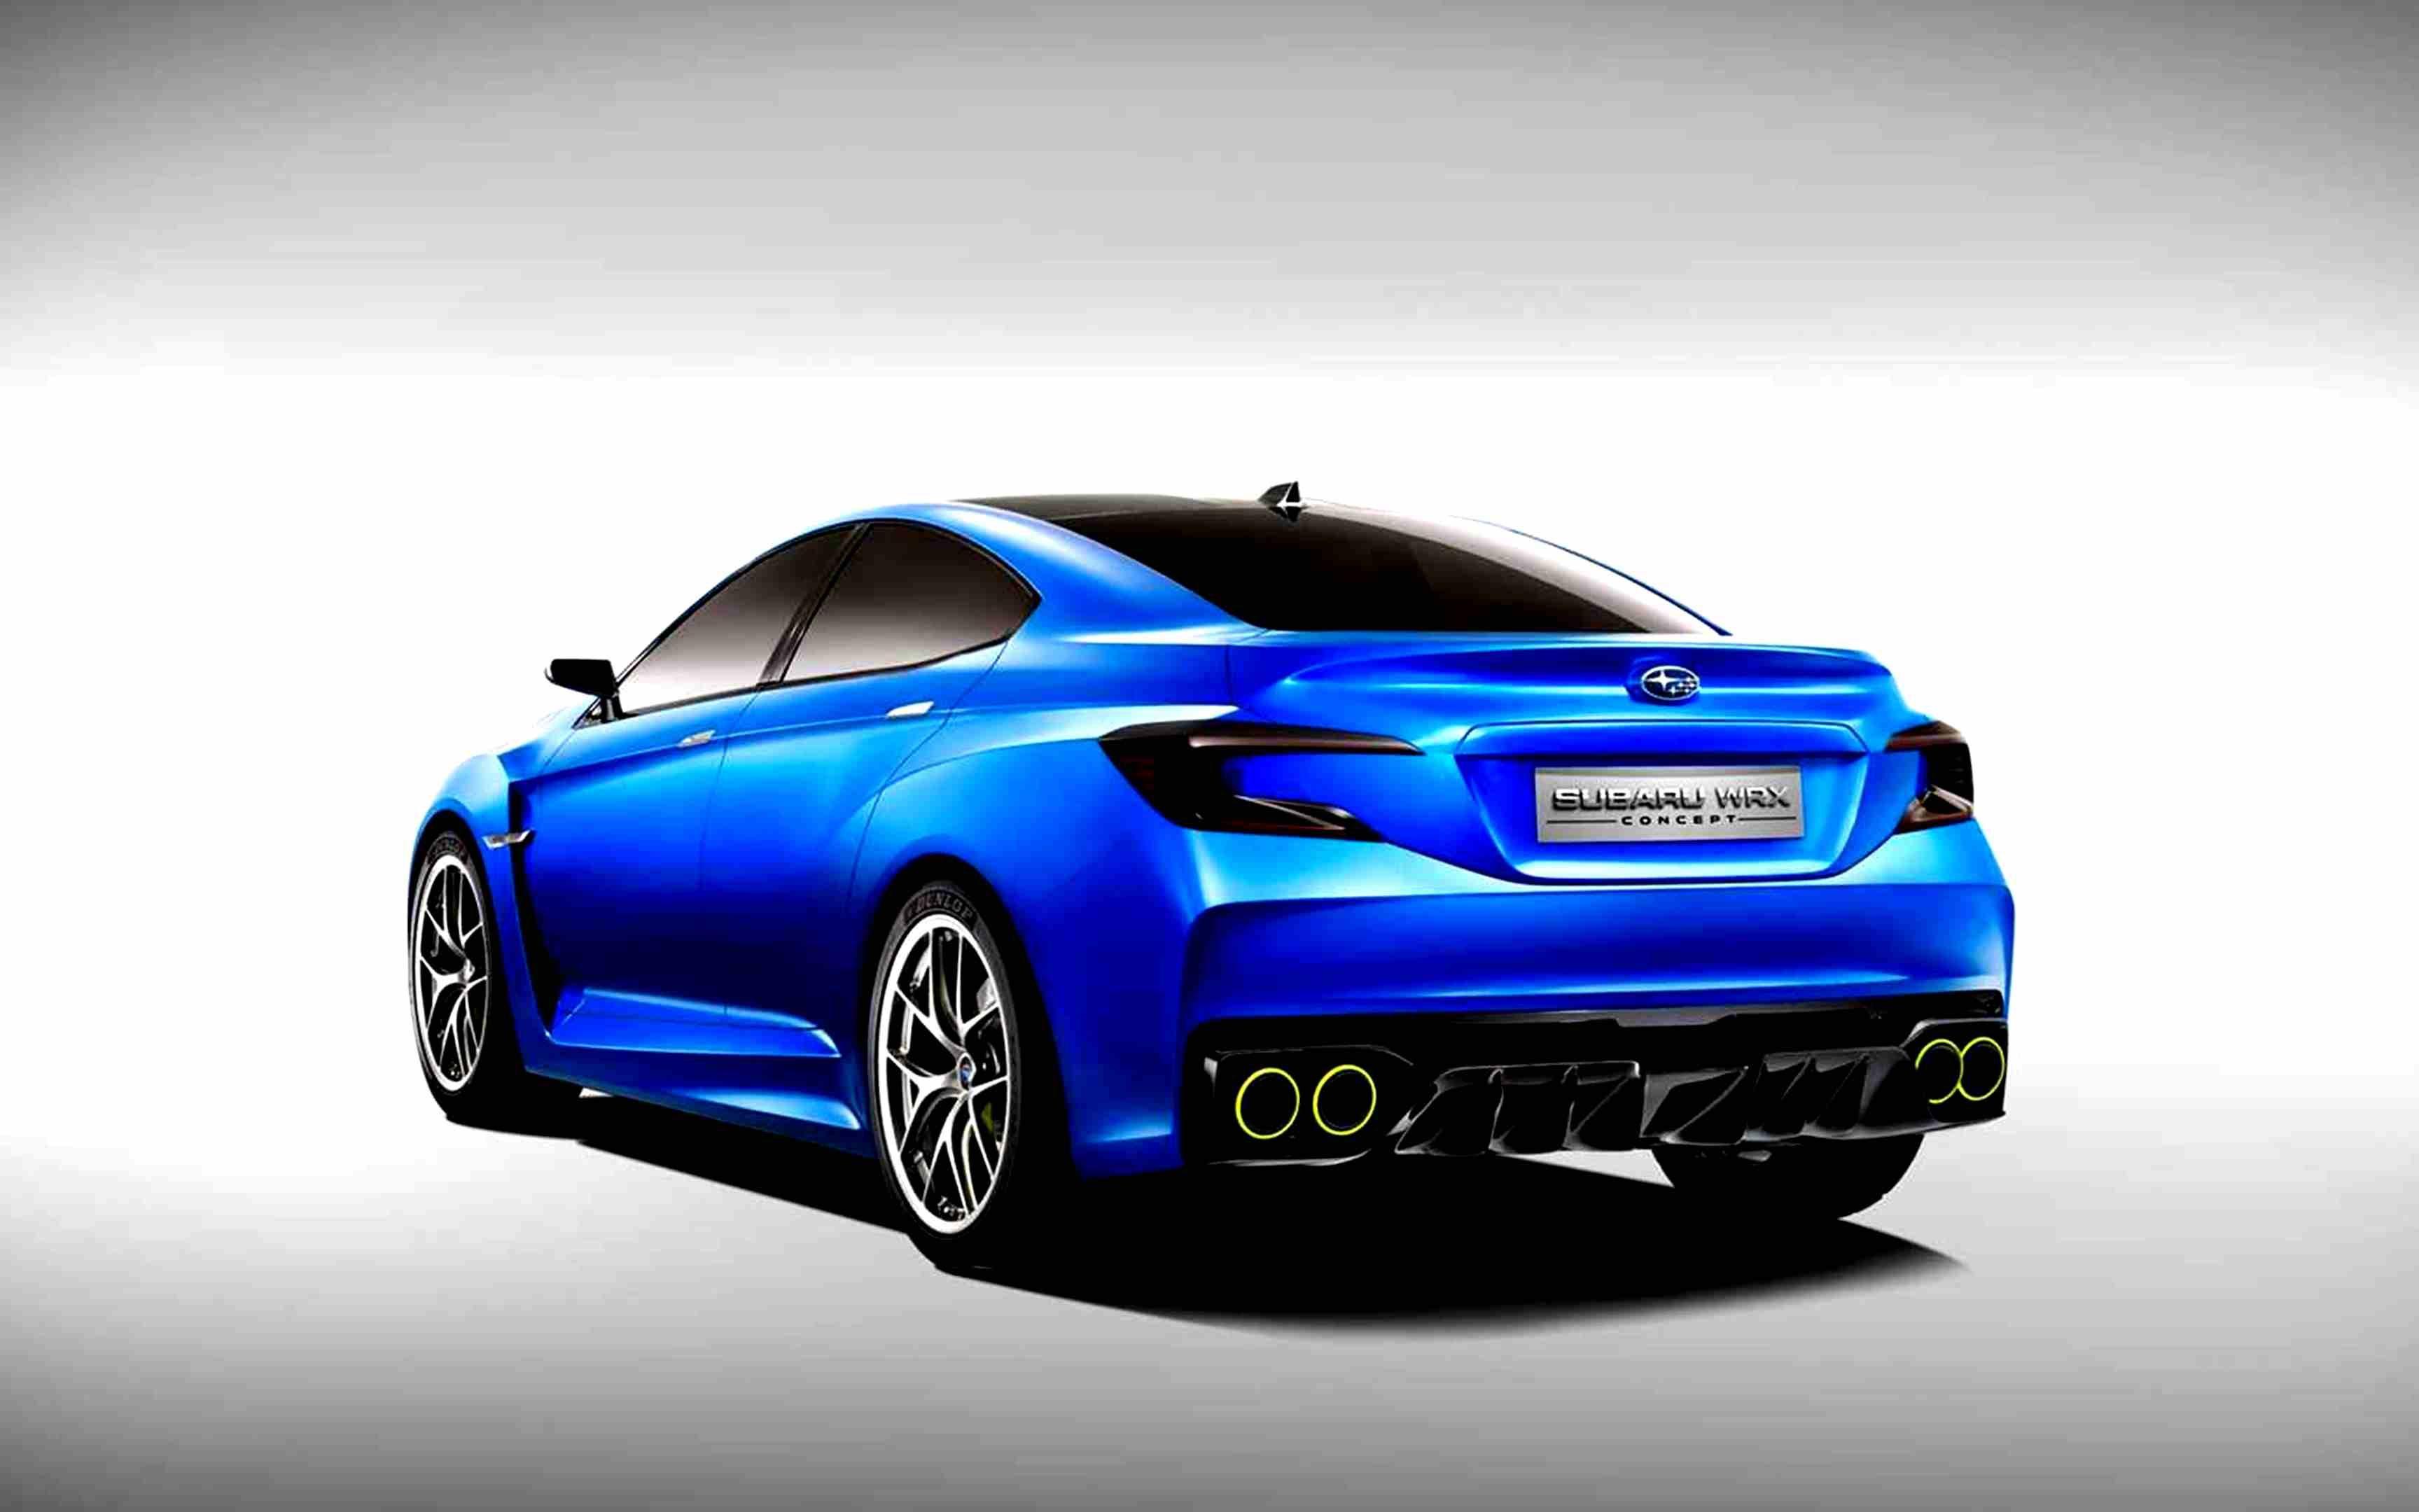 2015 subaru brz turbo 2015 subaru brz car backgrounds car rh pinterest com